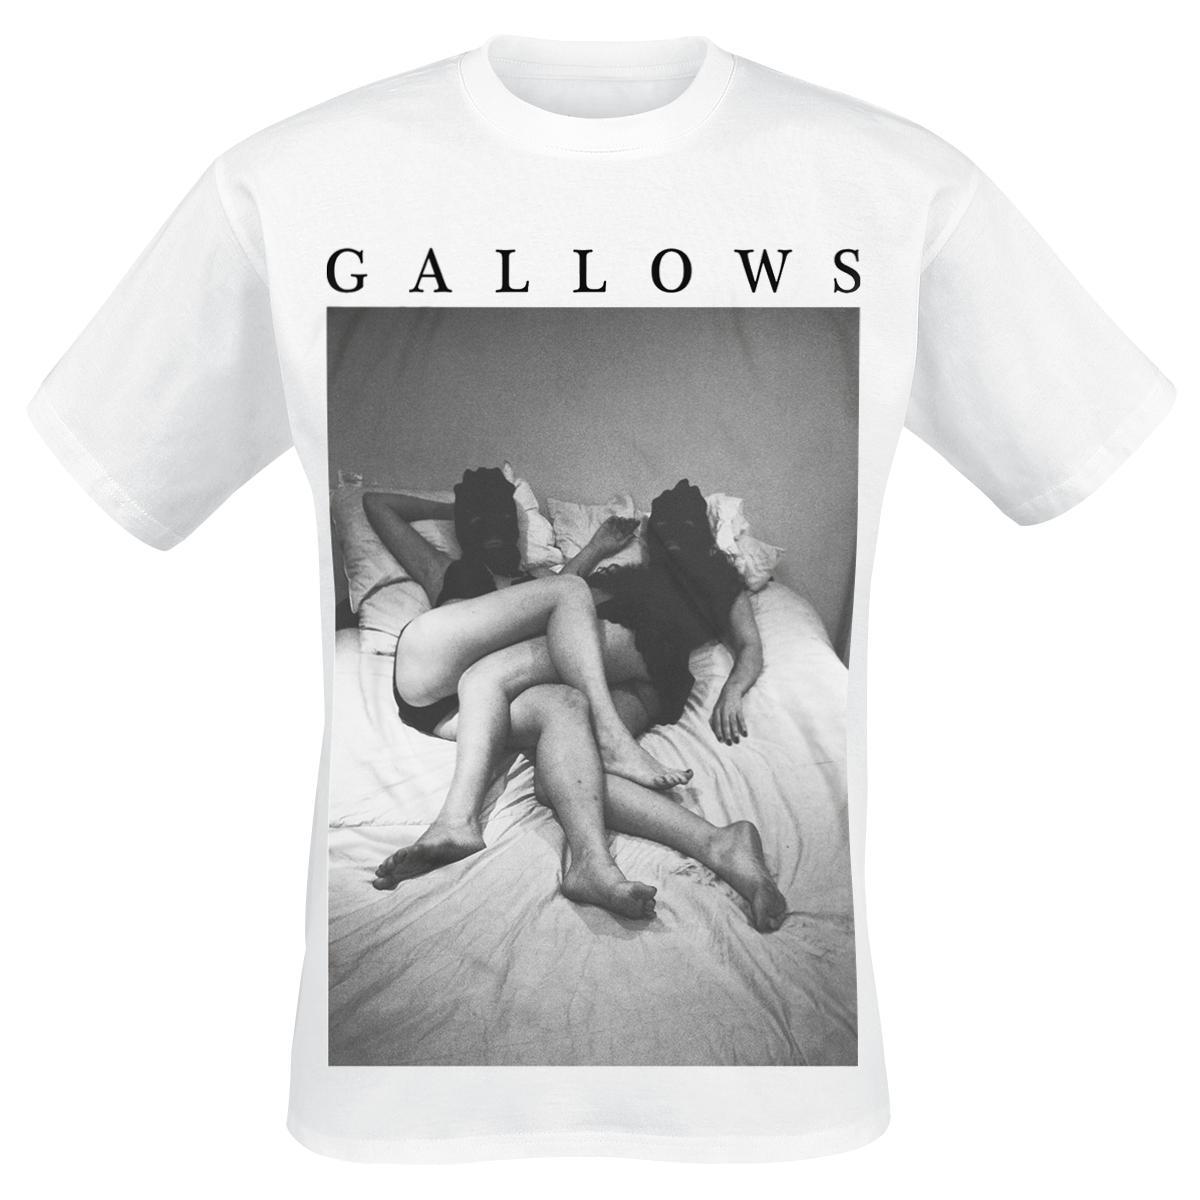 Gallows-cover-T-shirt-Venn-Records